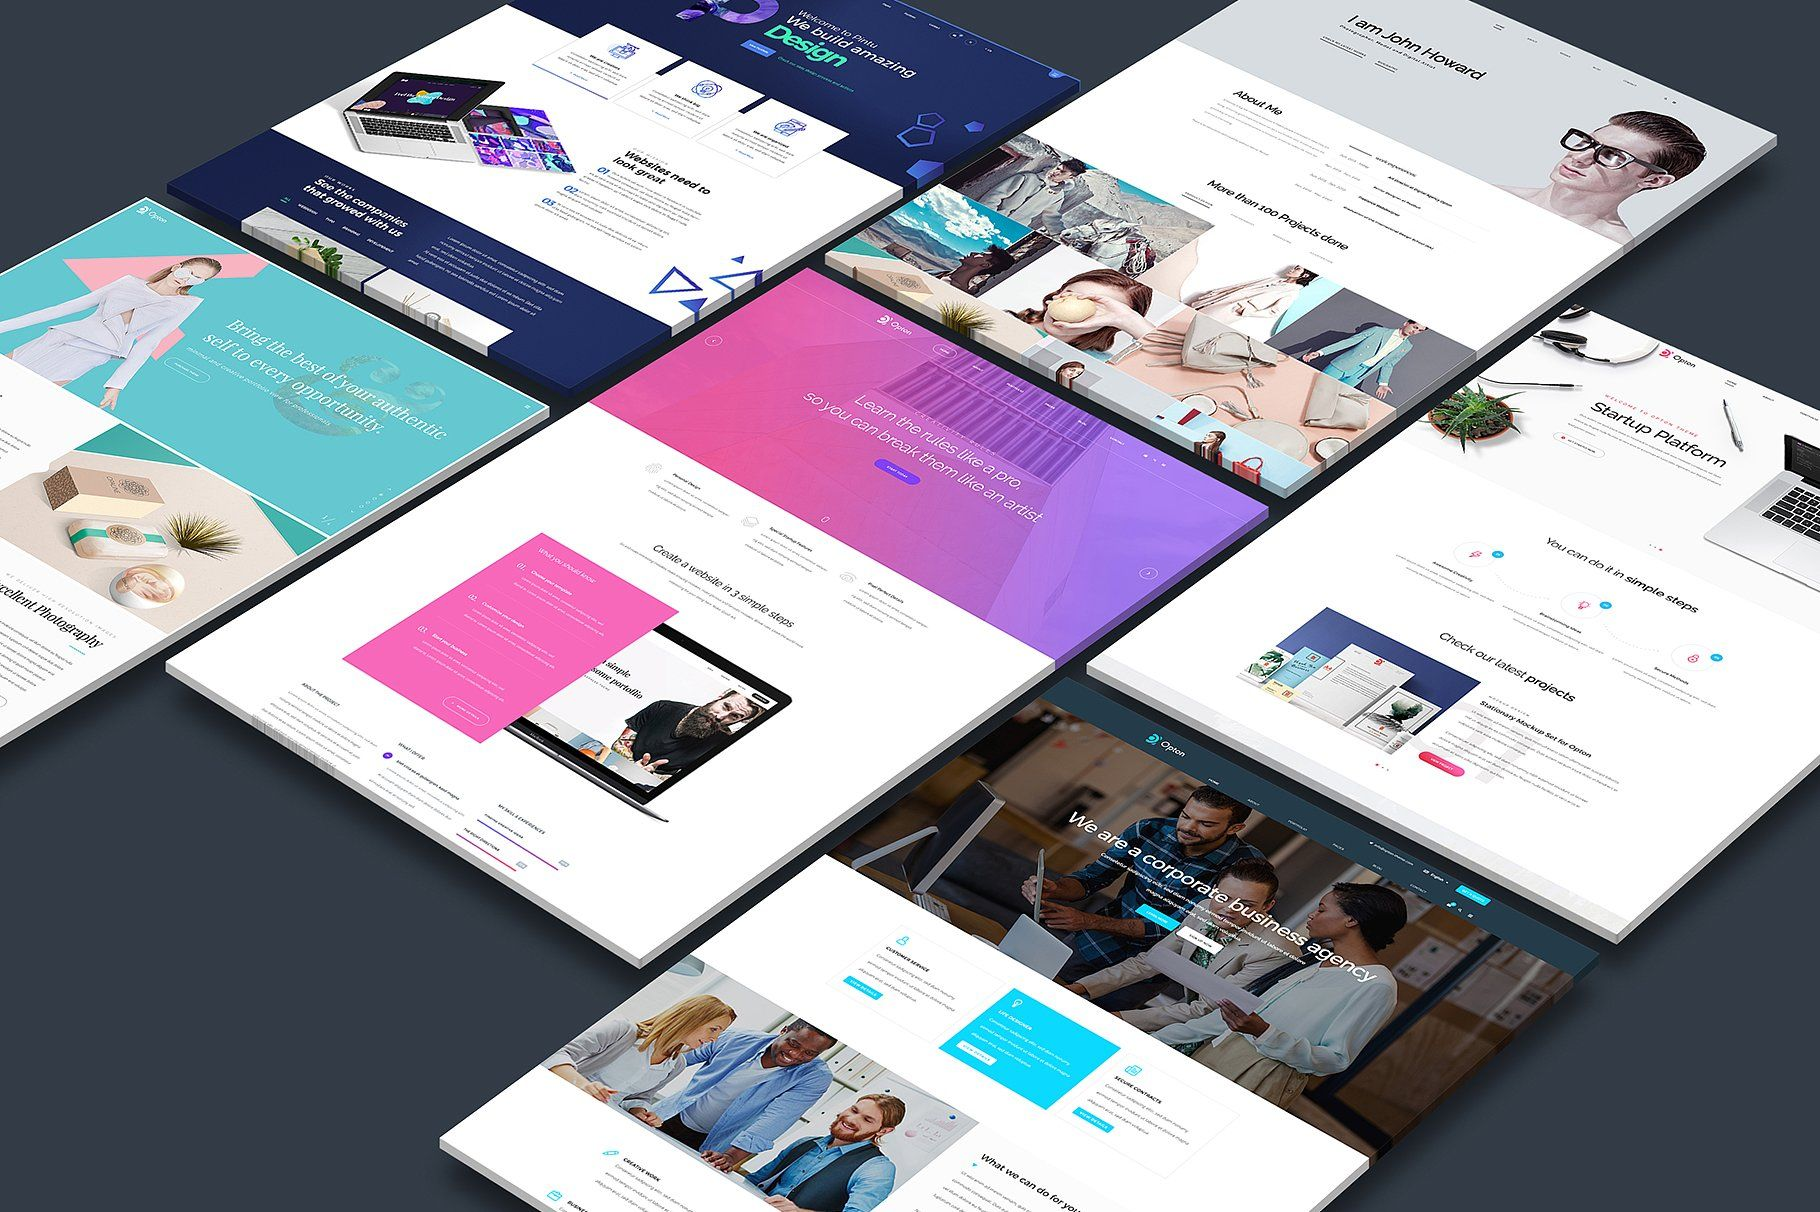 The Perspective Website Mockup 3 0 Website Mockup Photoshop Plugins Website Mockup Templates